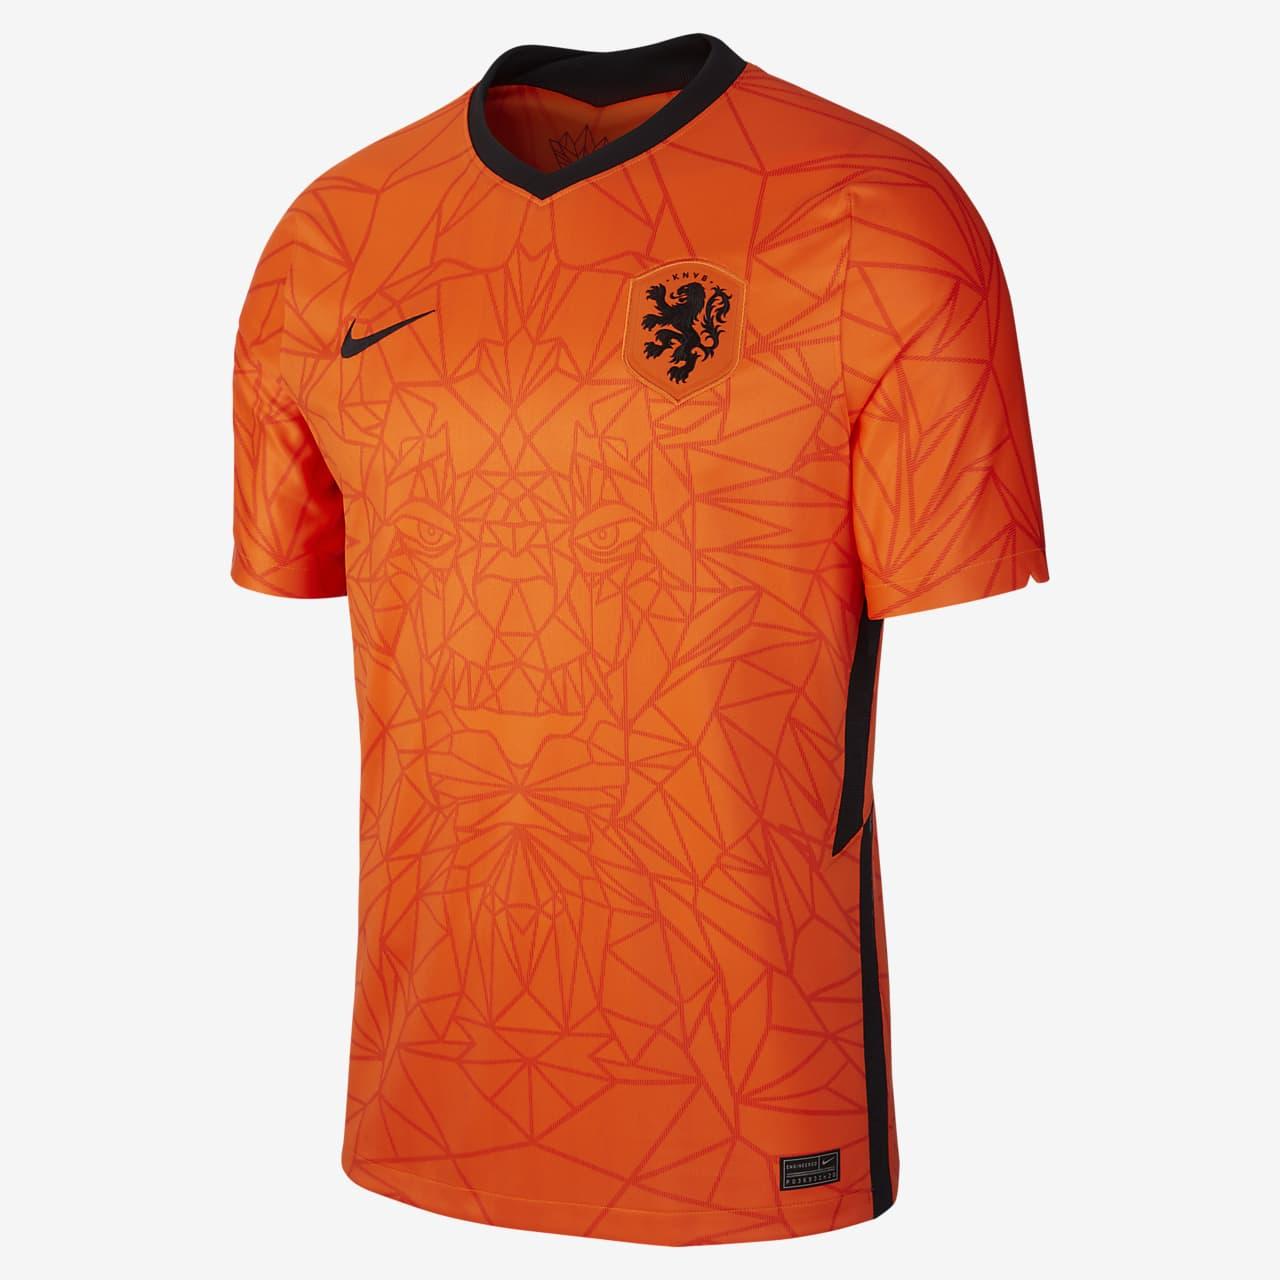 Maglia da calcio Olanda 2020 Stadium da uomo - Home